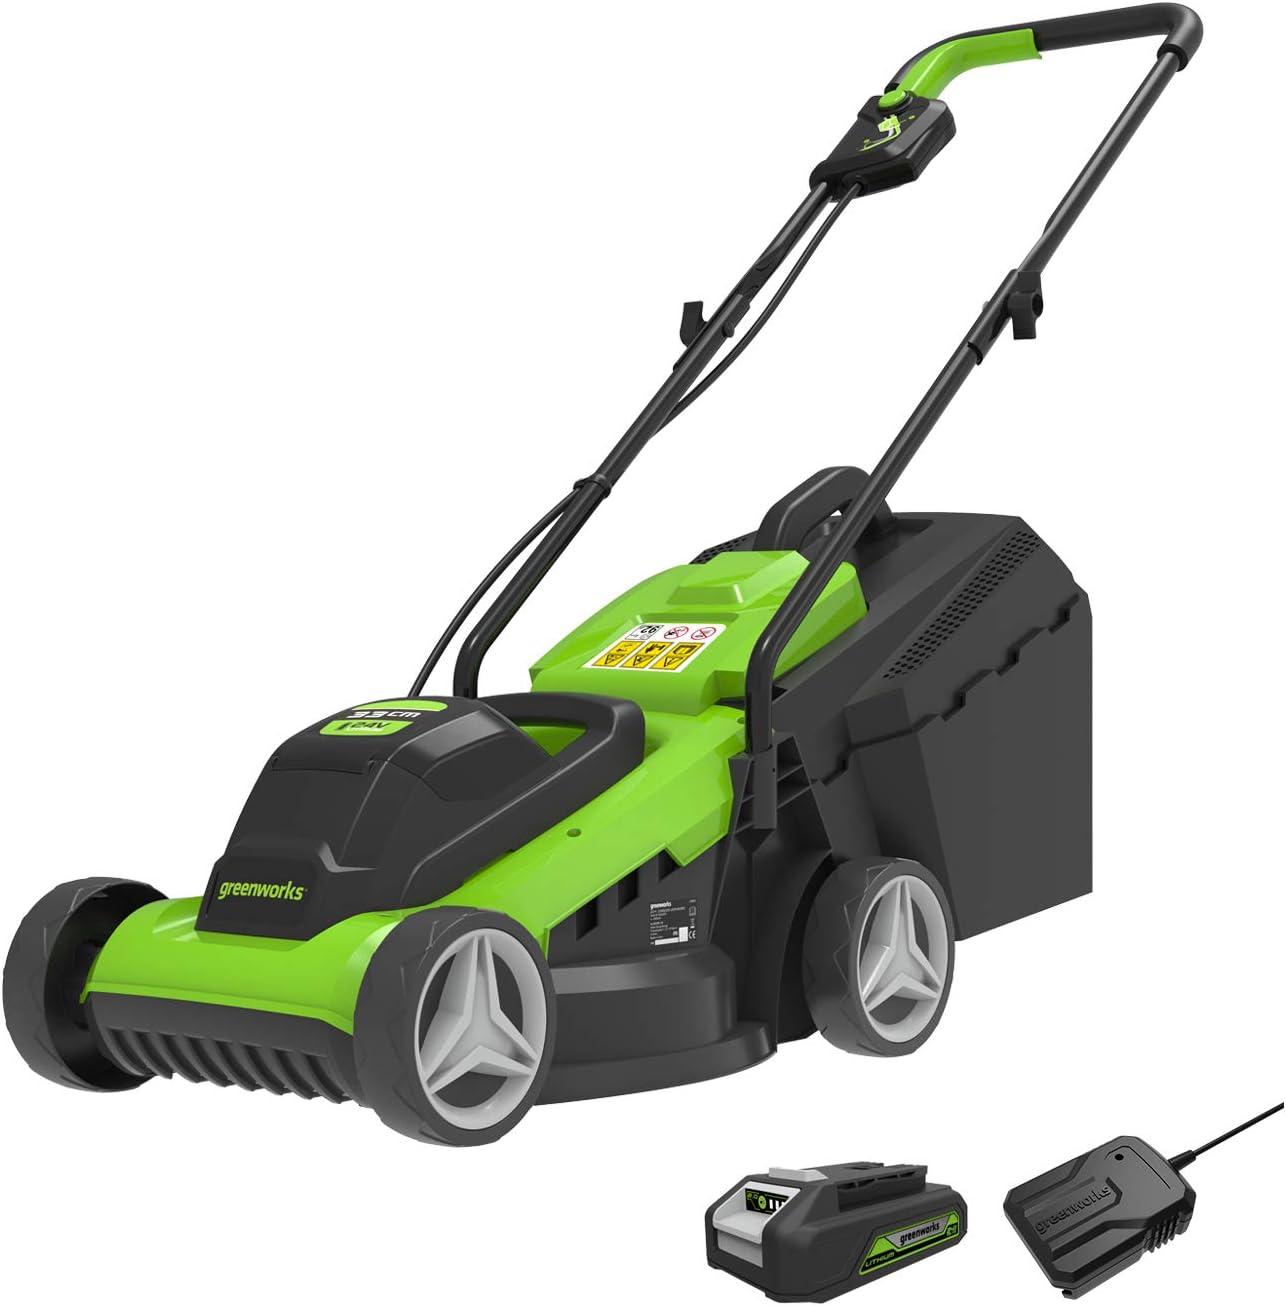 Greenworks 24 V 33 cm Cordless Lawnmower with 30 L Grass Catcher Bag